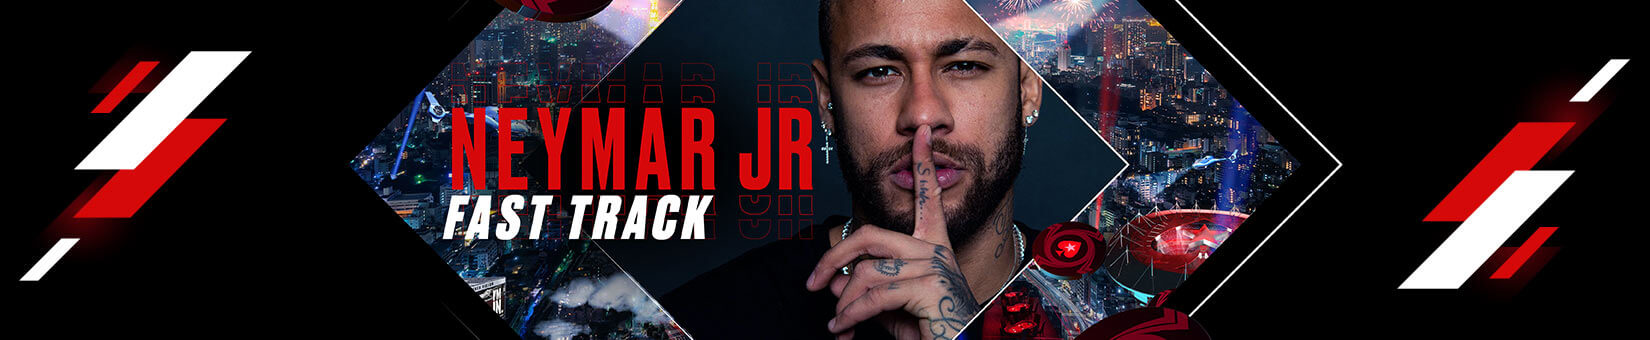 Neymar CS Fast Track